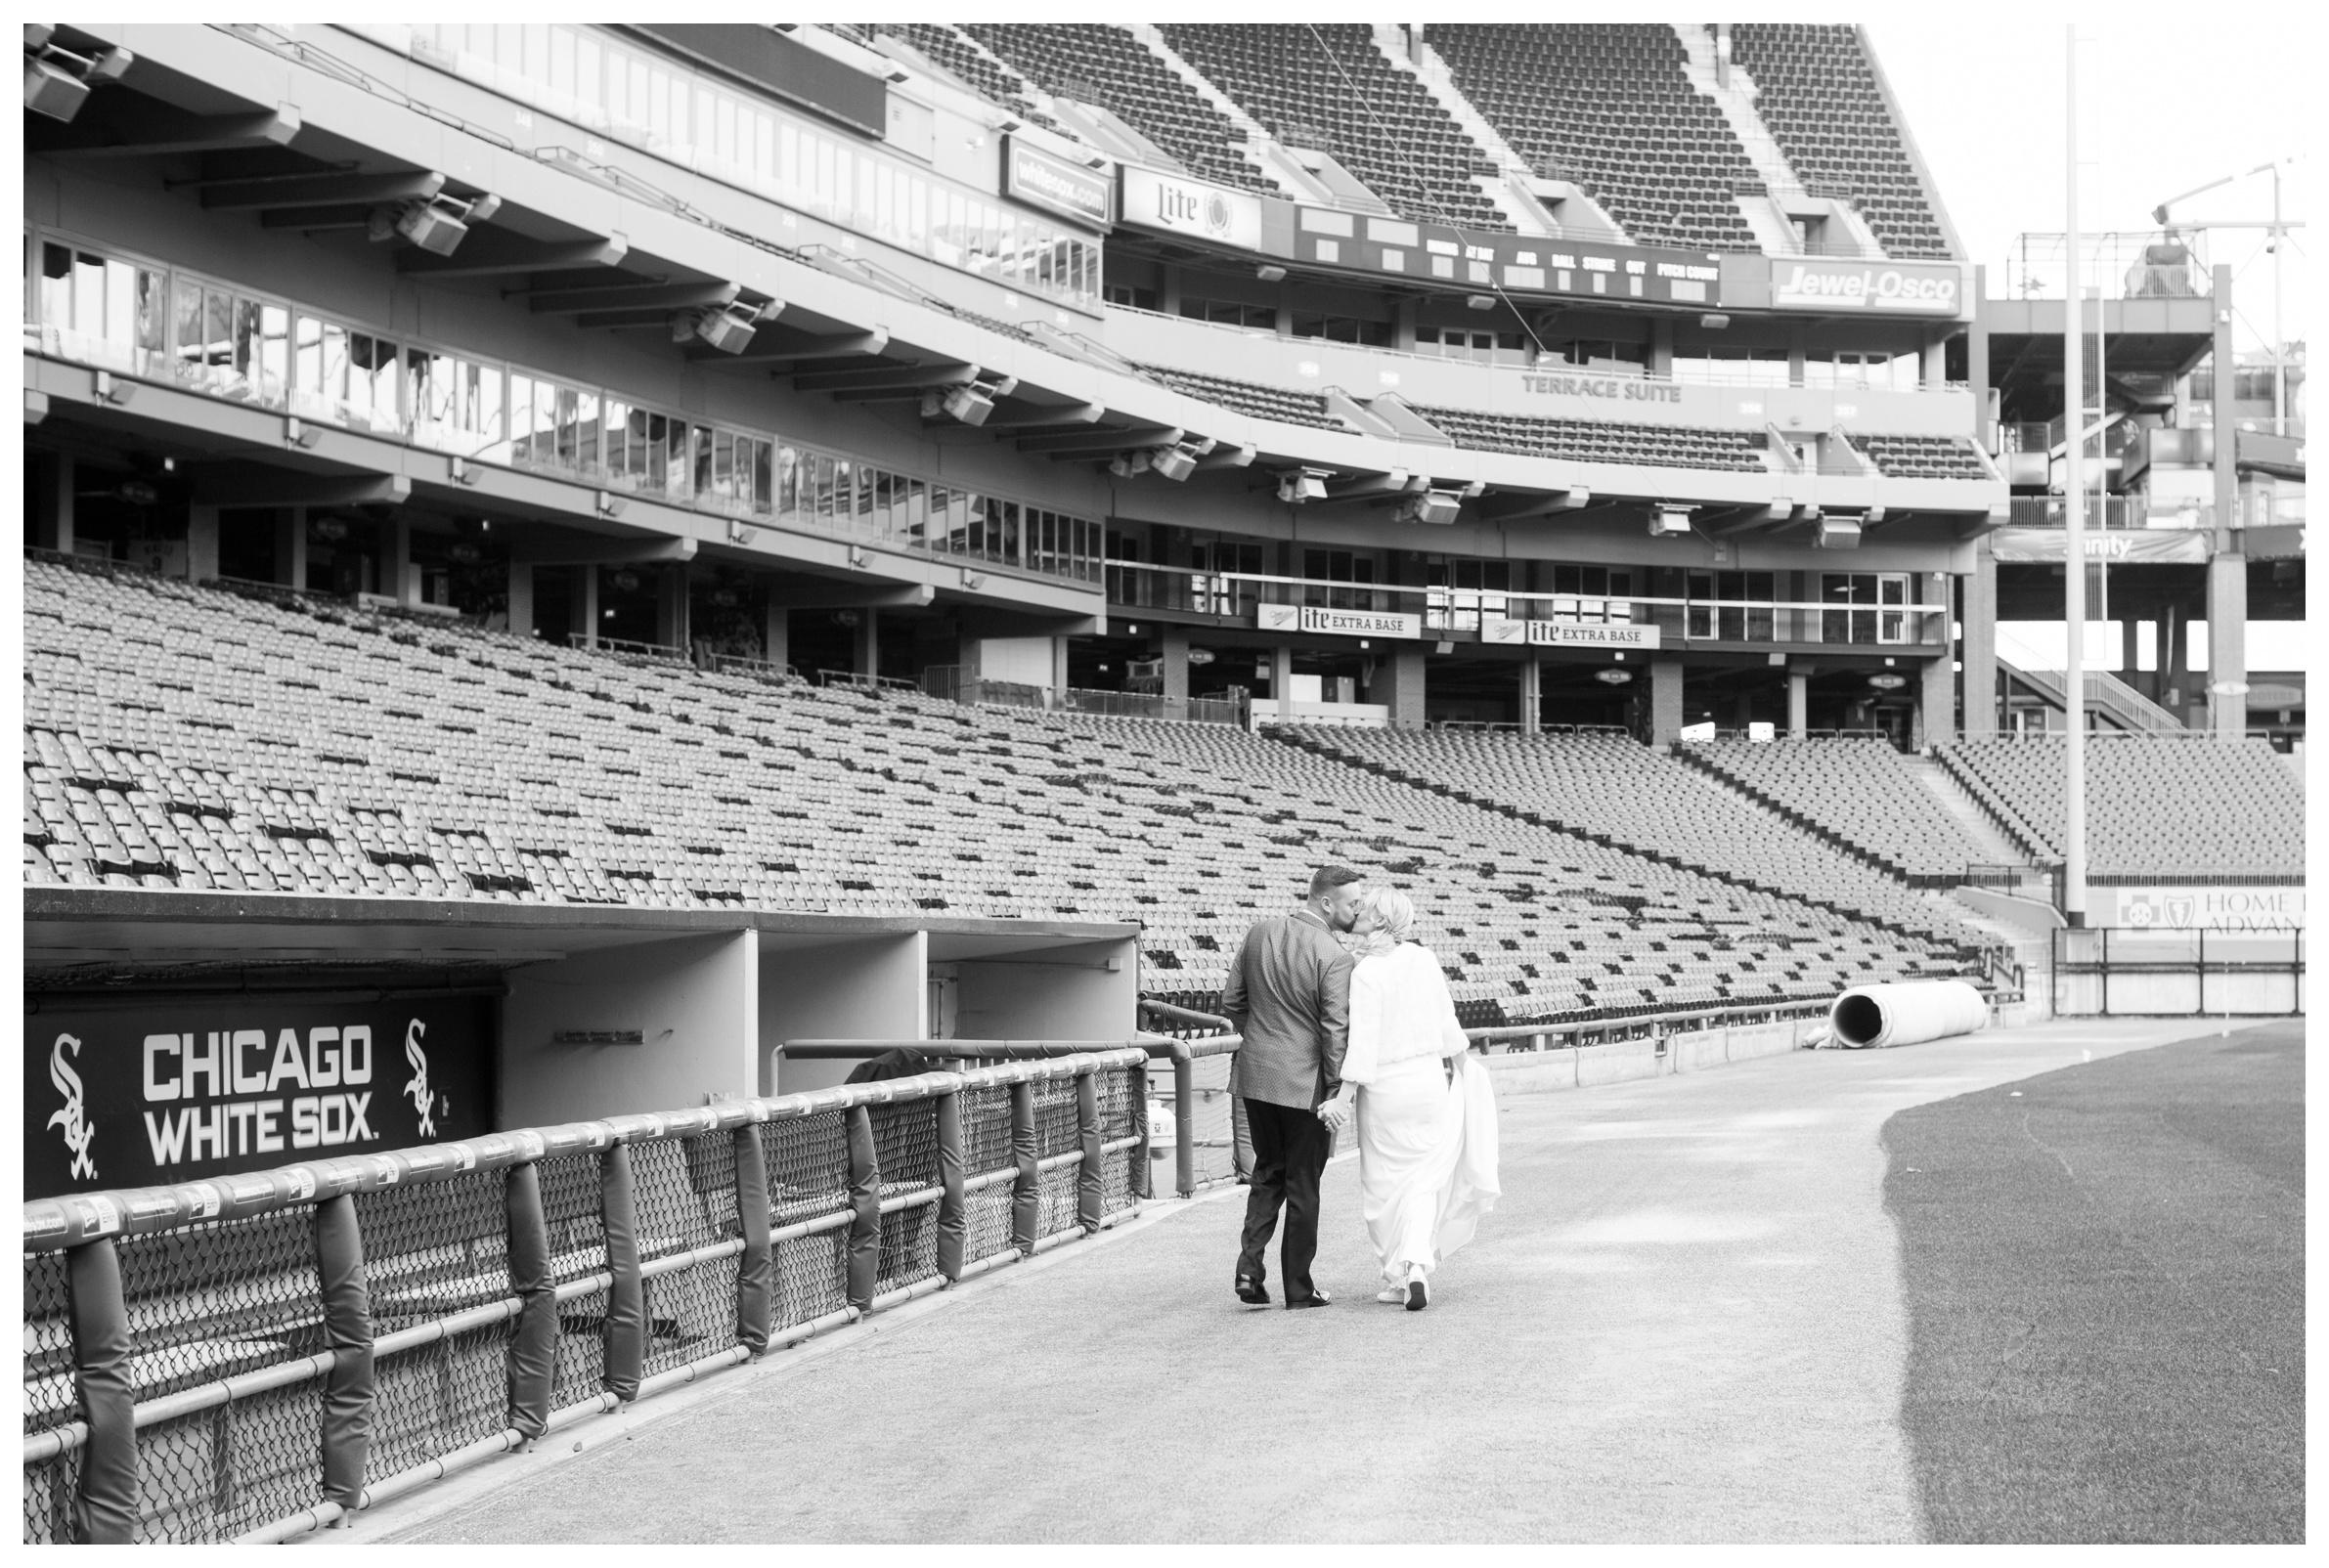 white-sox-baseball-wedding-photographer